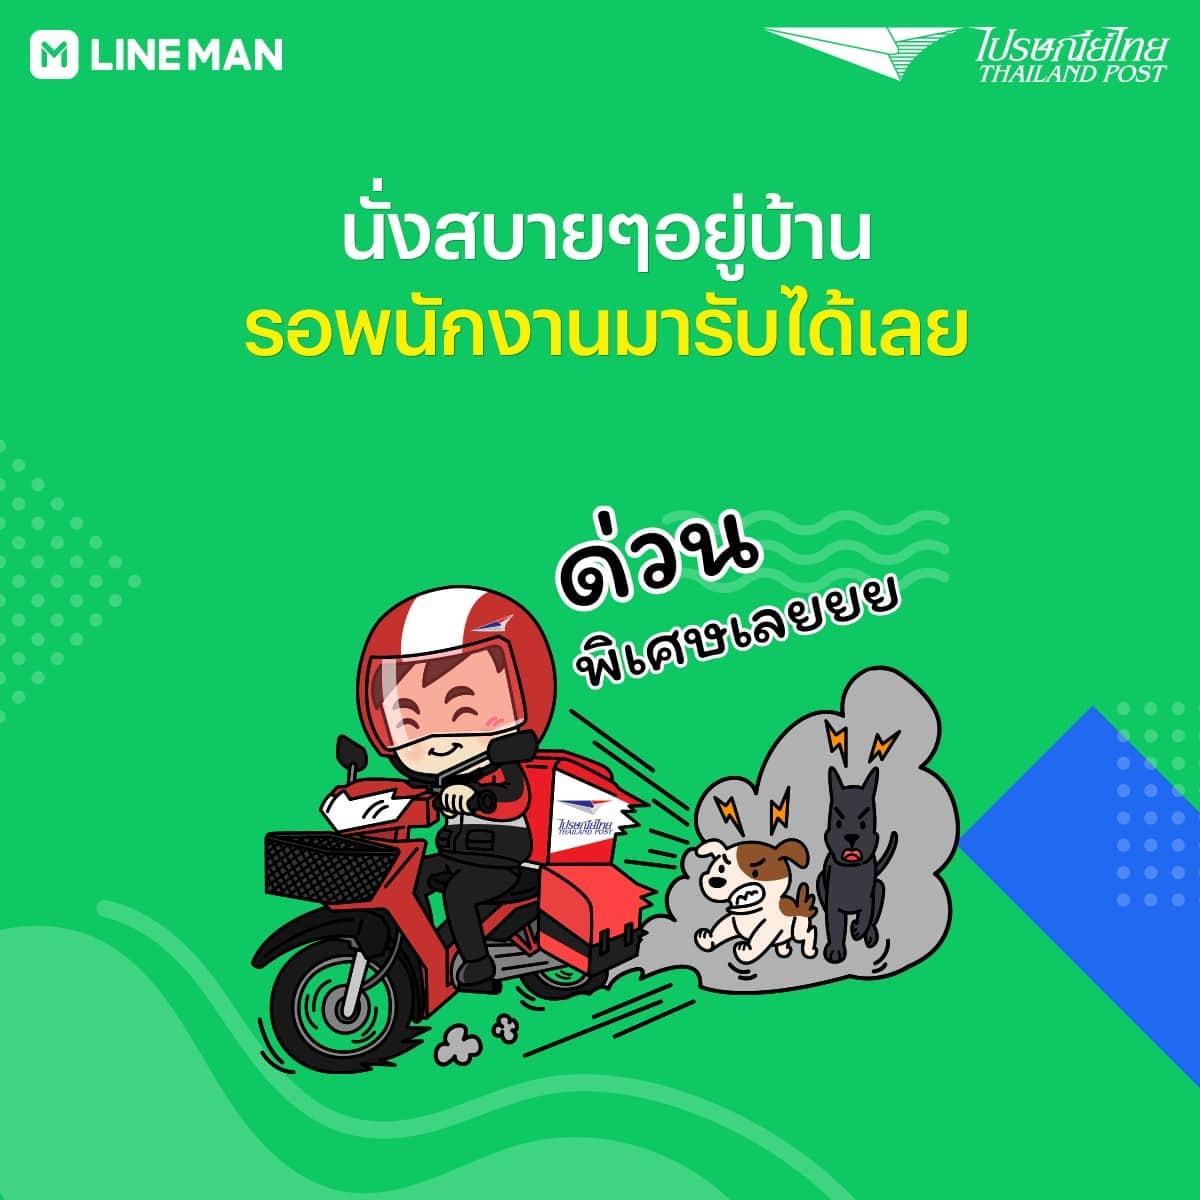 LINE Thailand Post 00002 - ไปรษณีย์ไทย ลดค่าส่ง 5 บาทต่อกล่อง เพียงใช้บริการผ่าน LINE Official Account